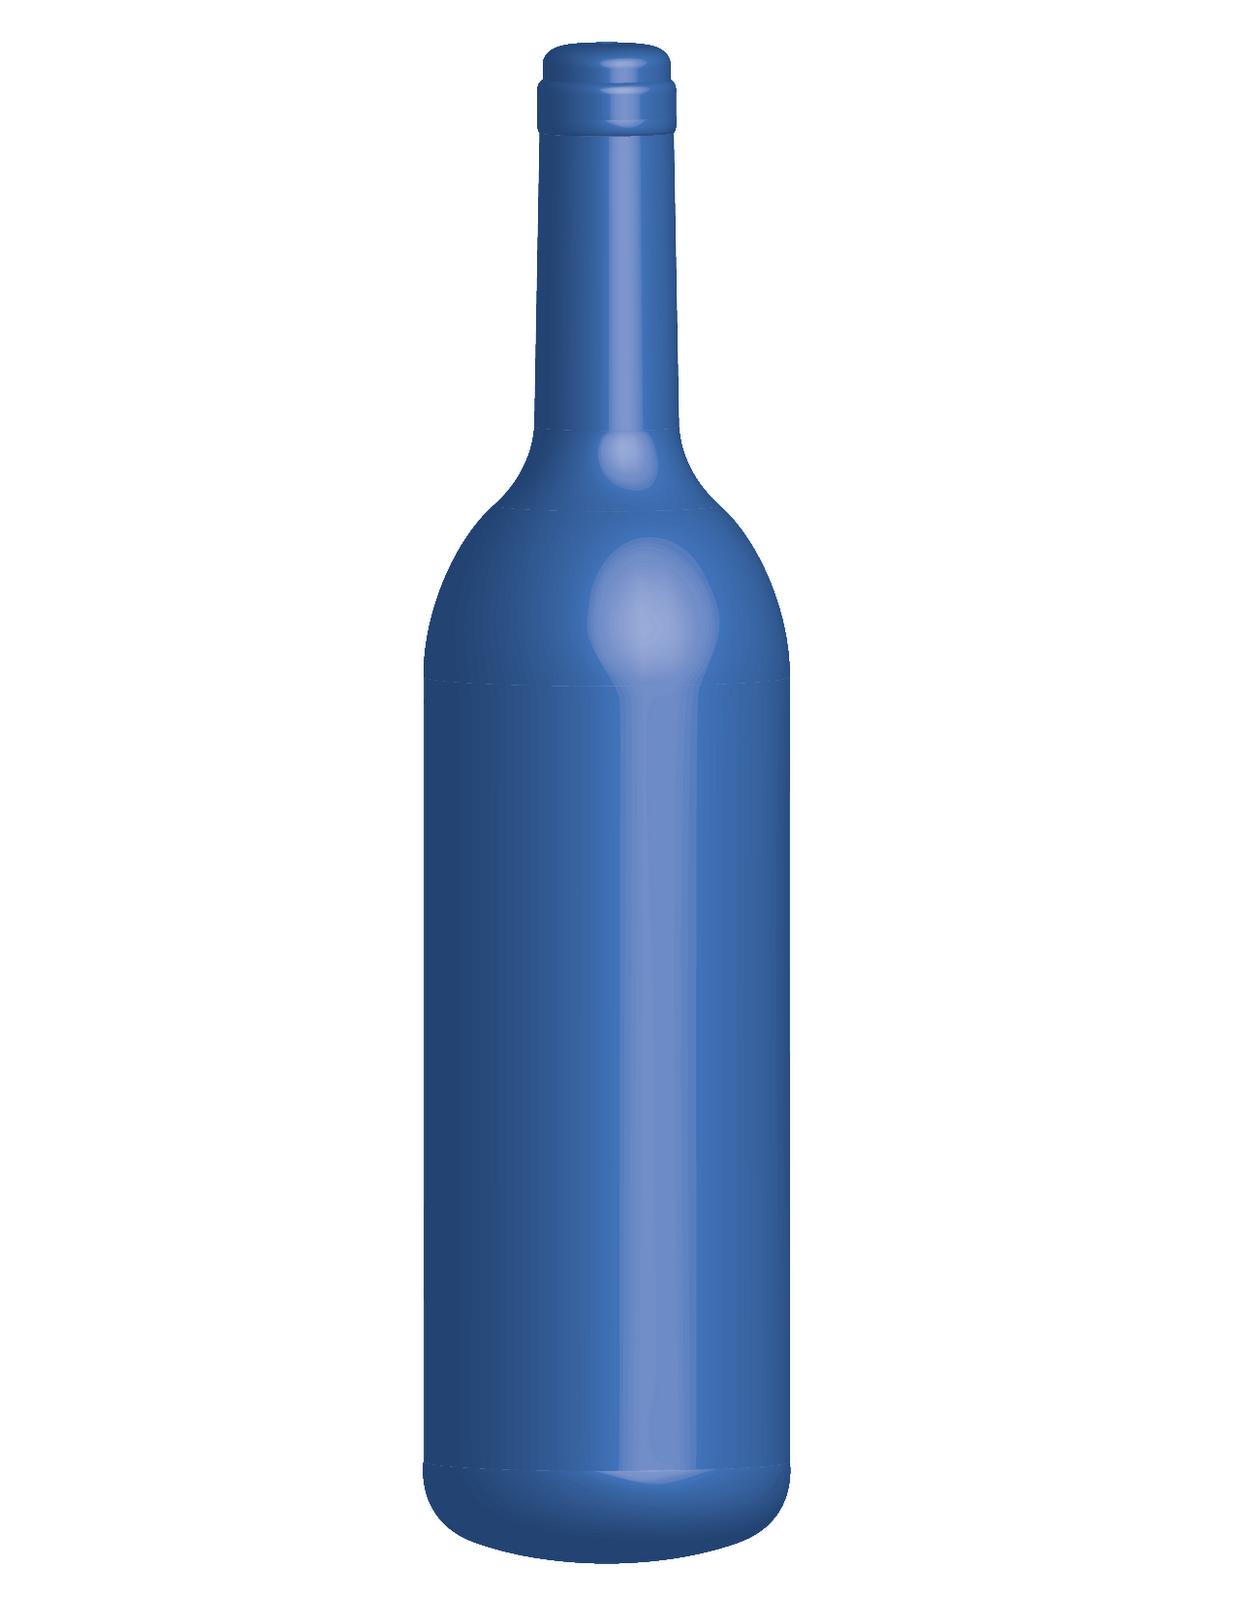 Principles of Graphic Art: Bottles